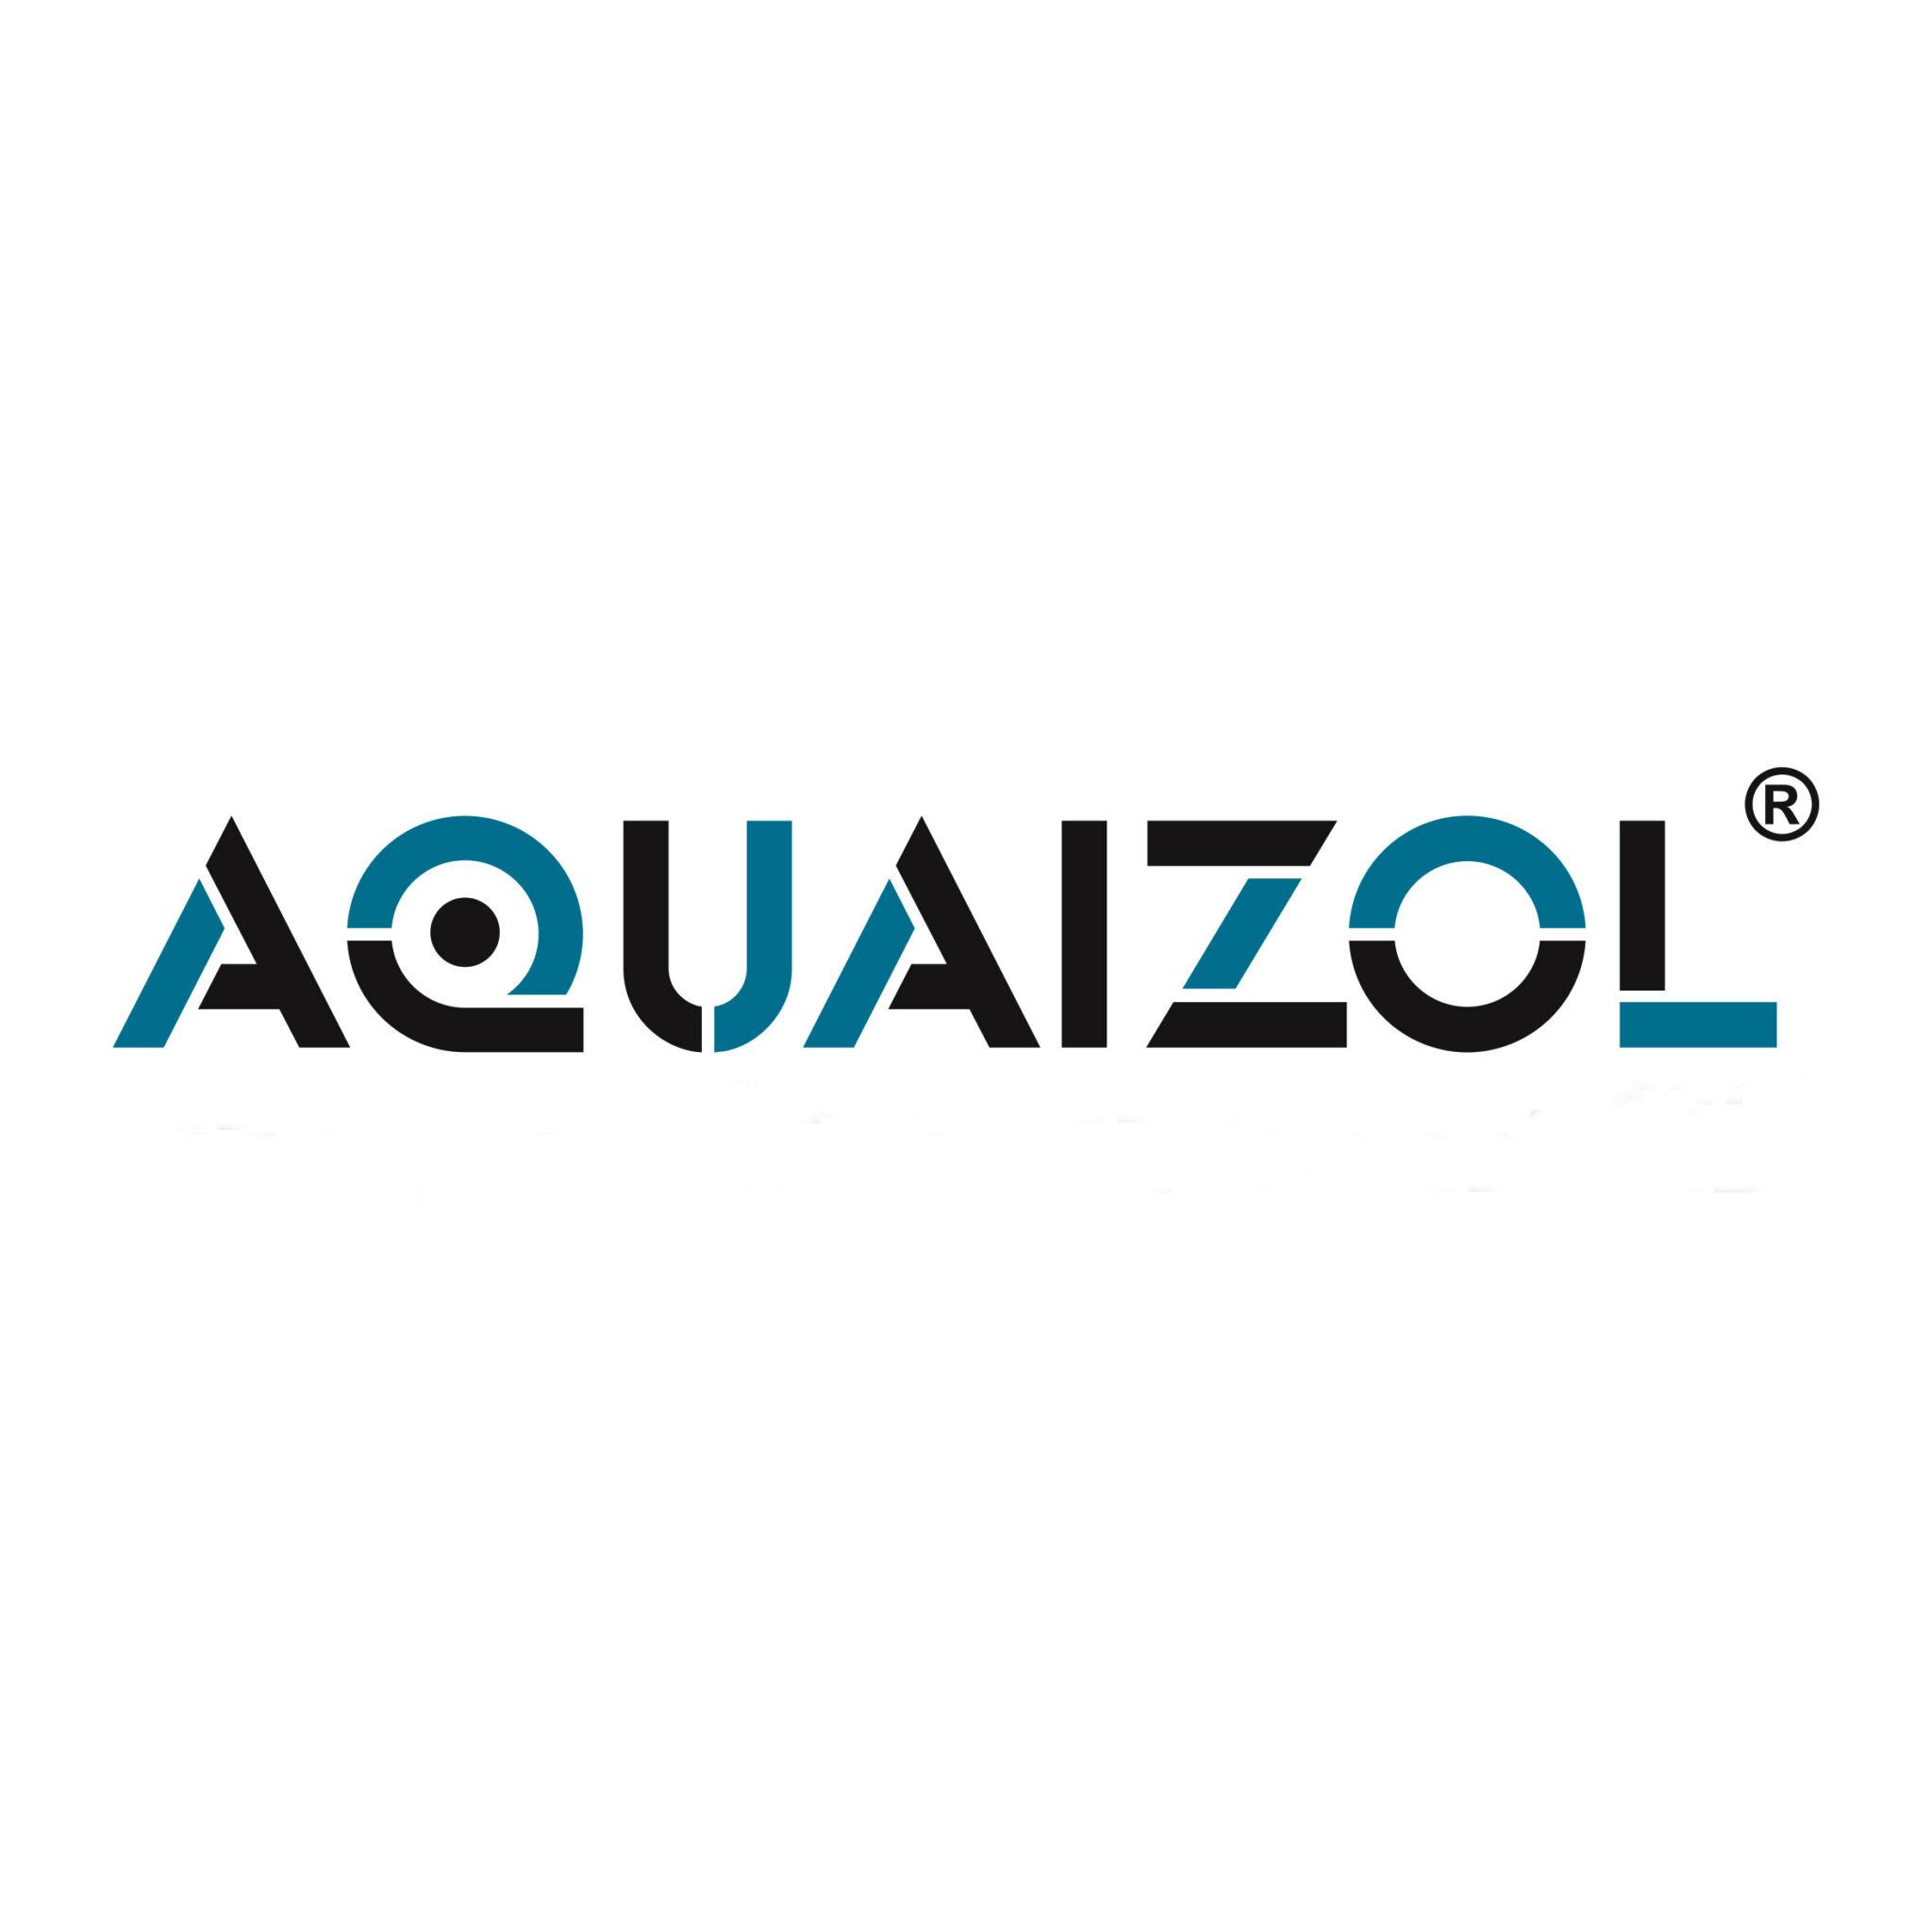 https://www.ua-bud.com.ua/wp-content/uploads/2018/03/logo-akvaizol-kvadrat-1.jpg